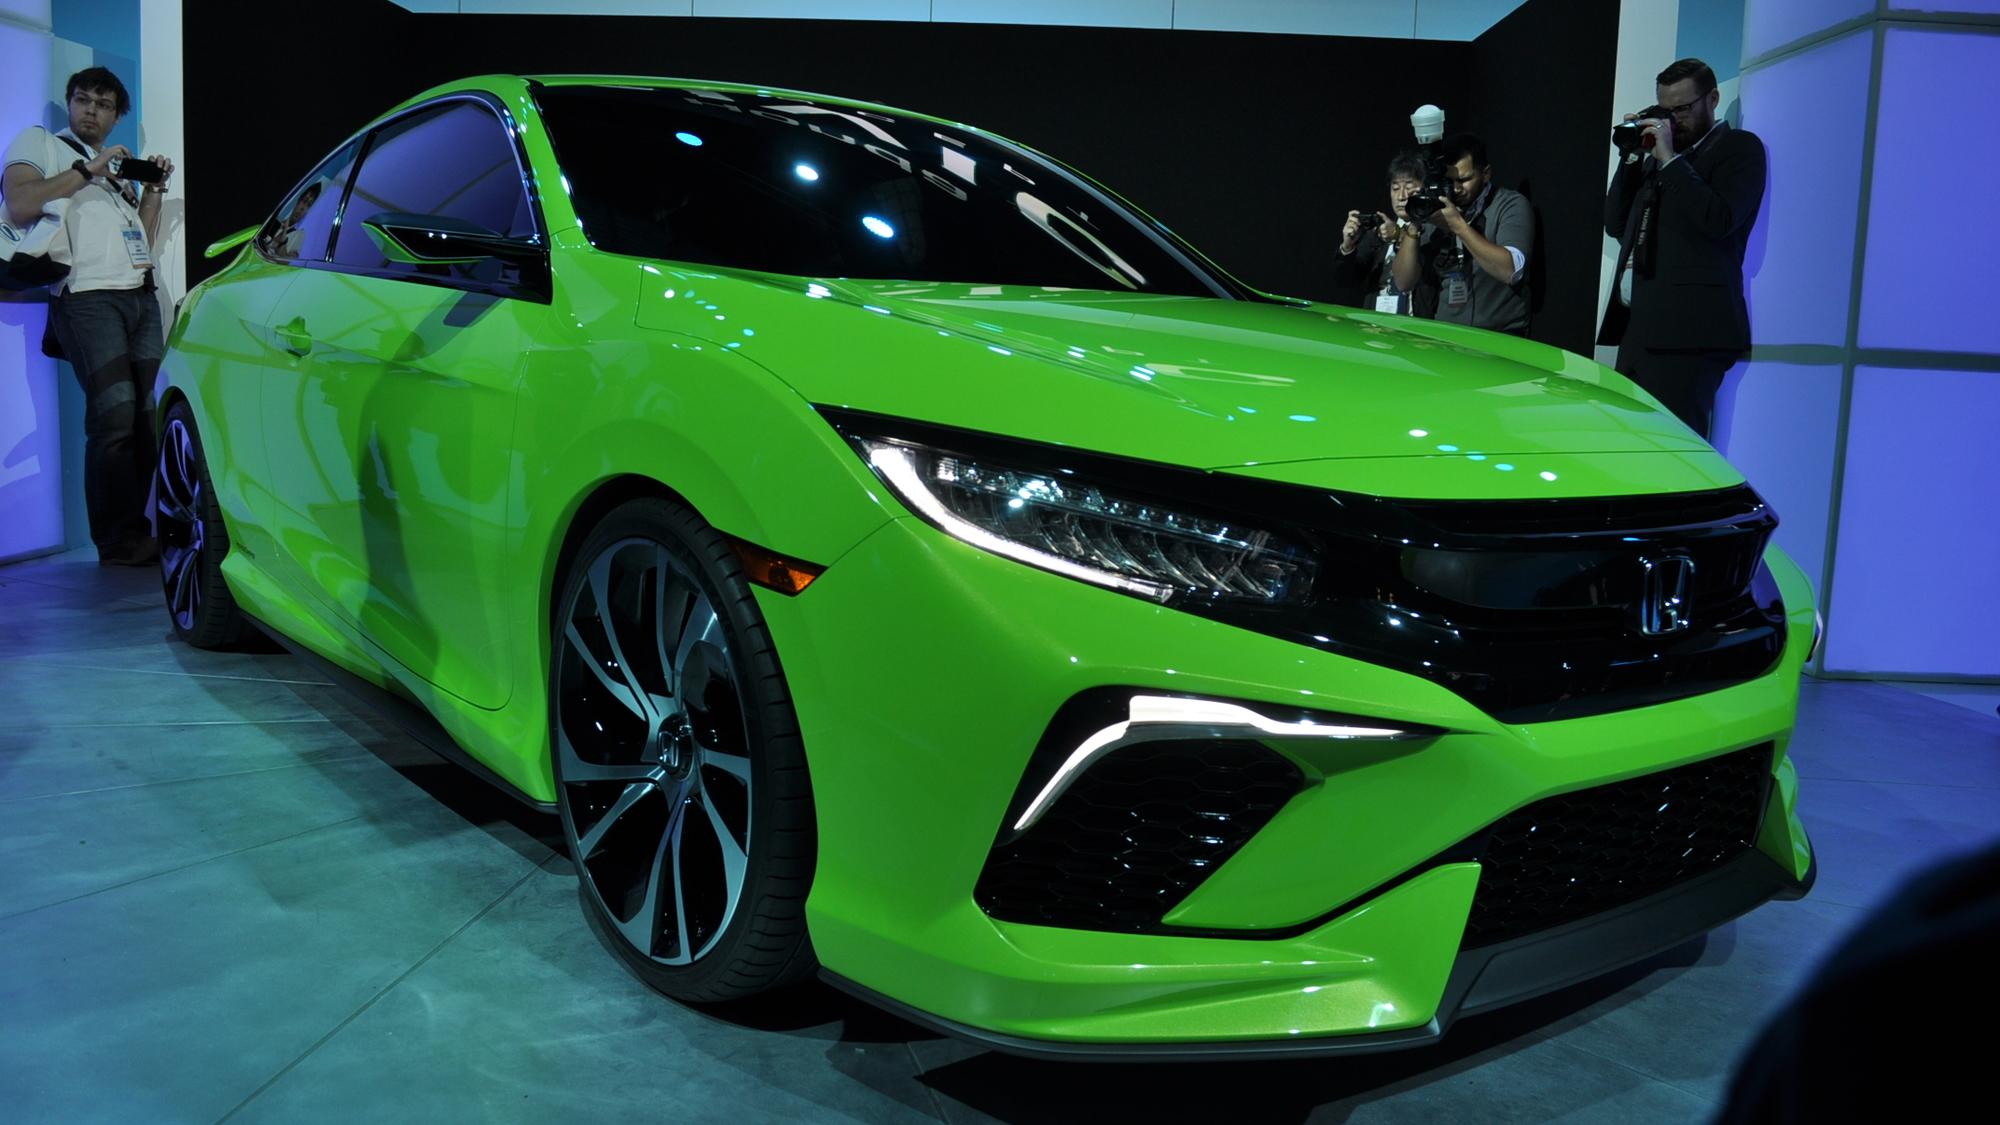 Honda Civic Concept Live Shots, 2015 New York Auto Show